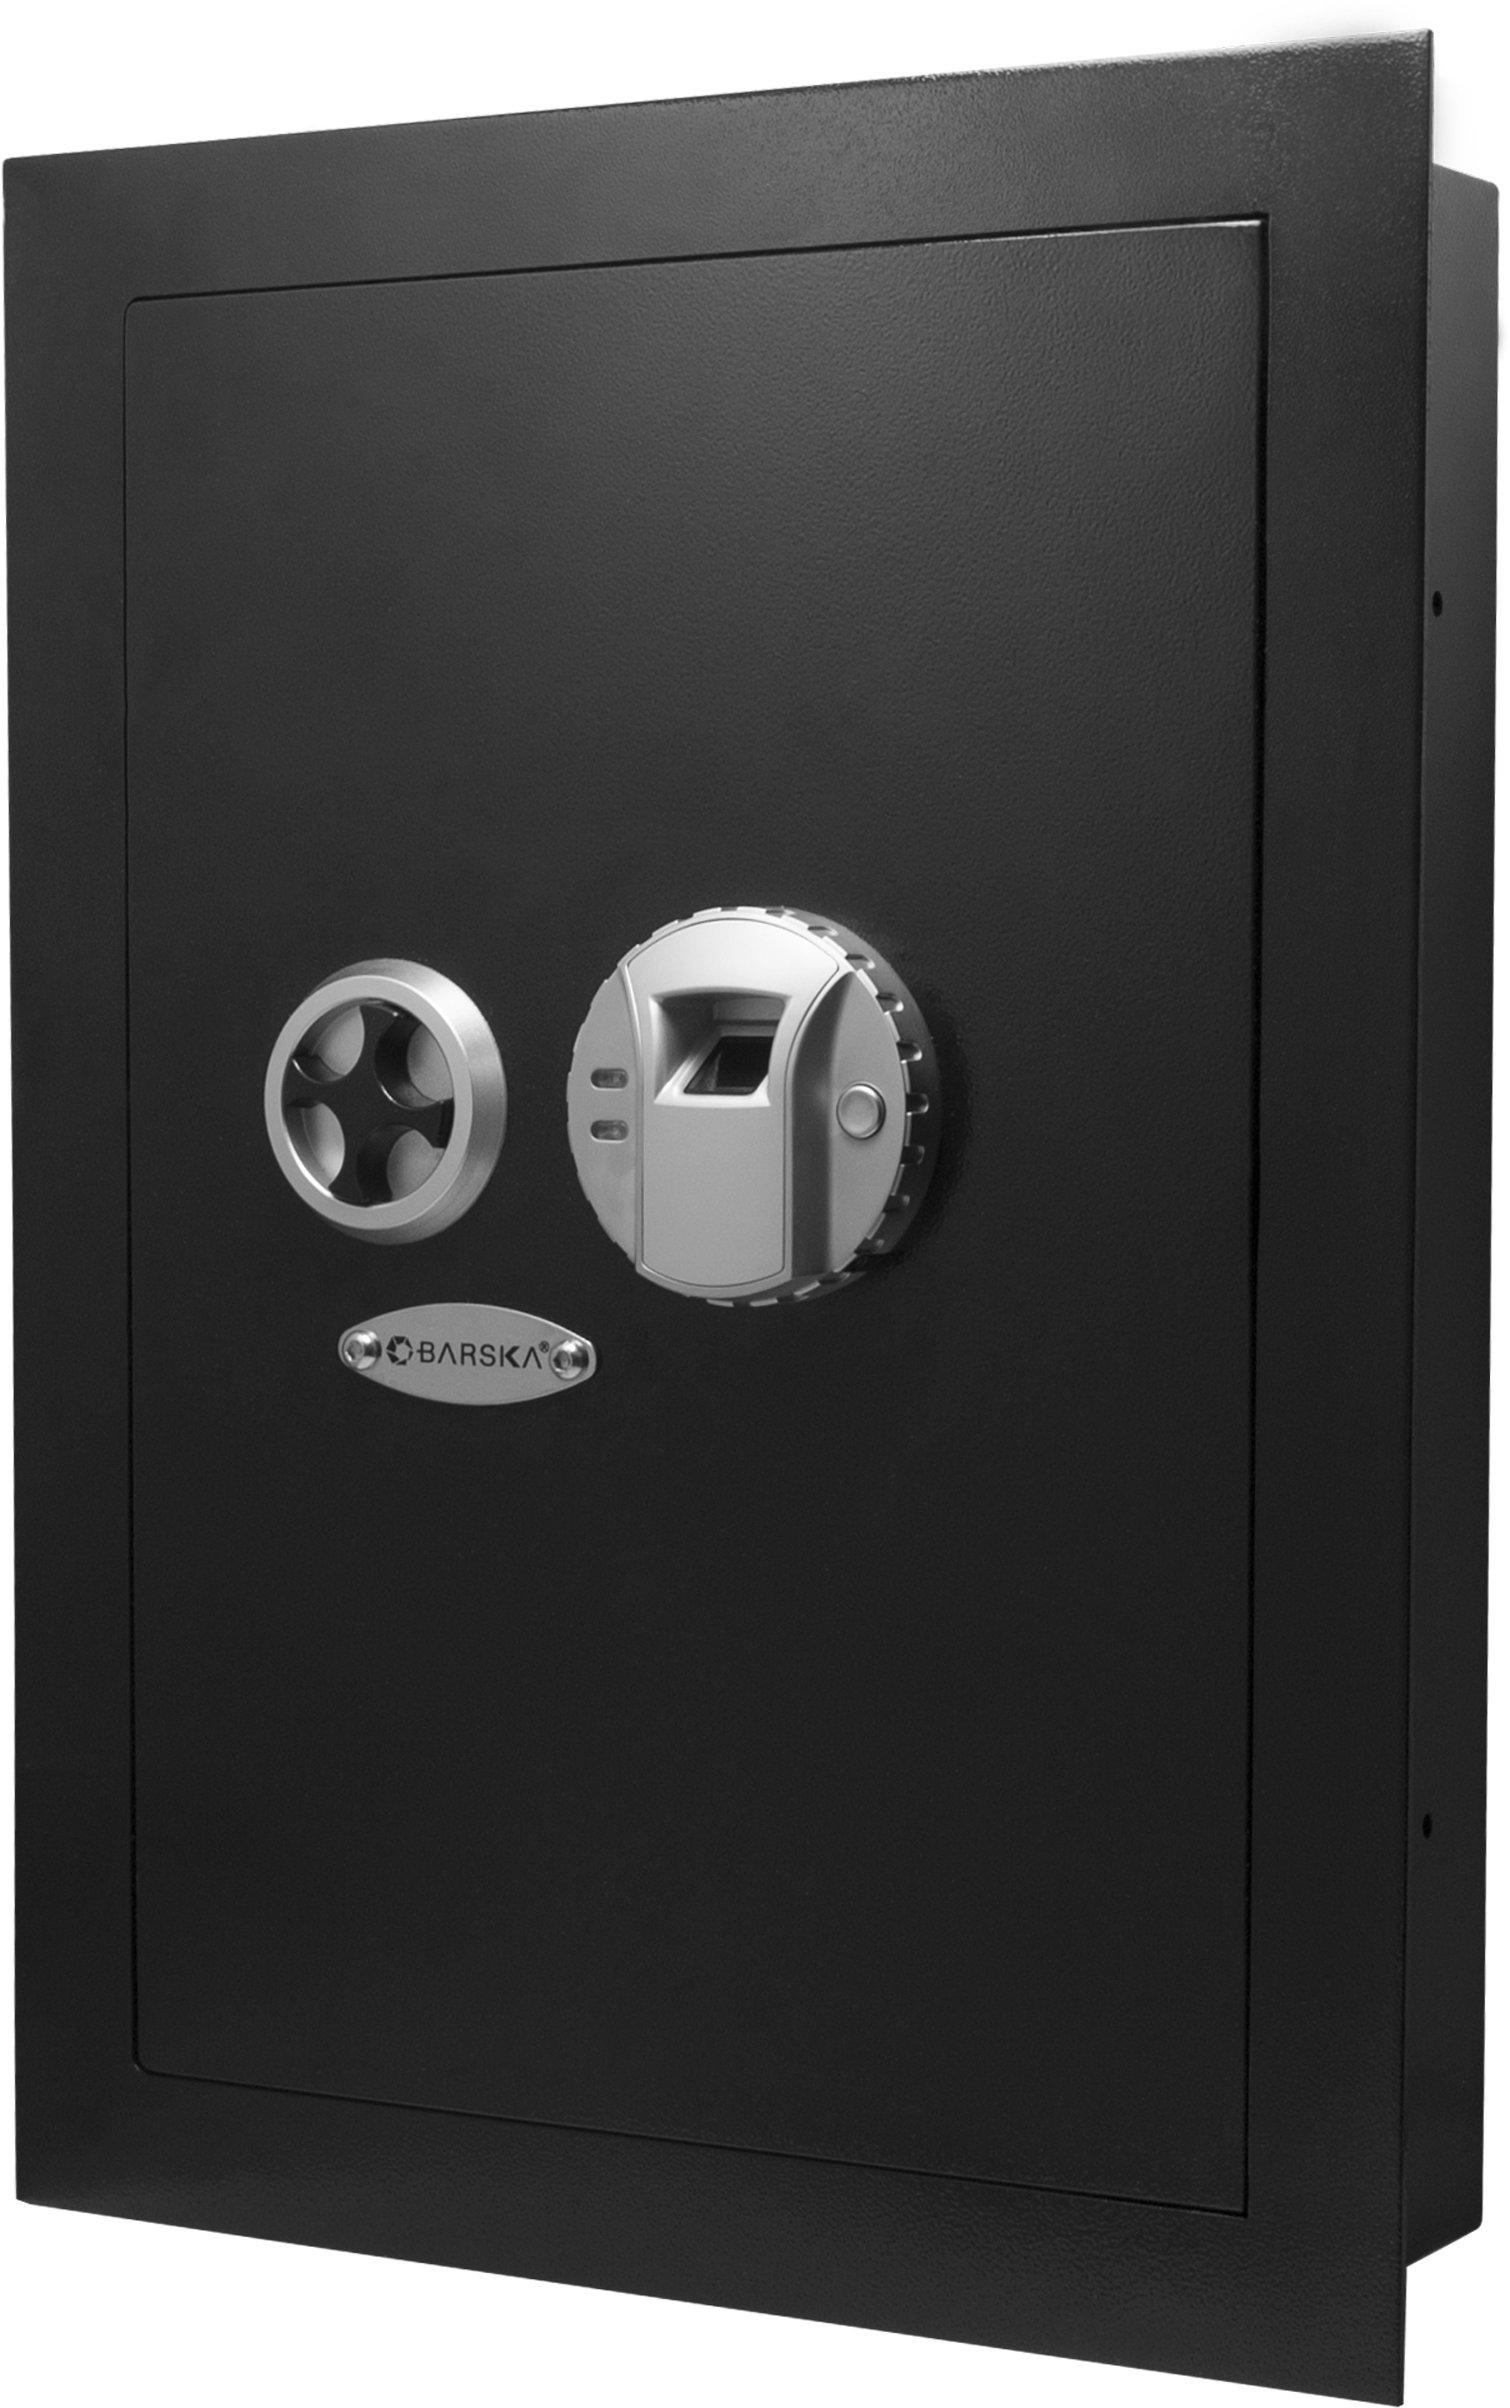 Barska AX12038 Biometric Wall Safe by BARSKA (Image #1)